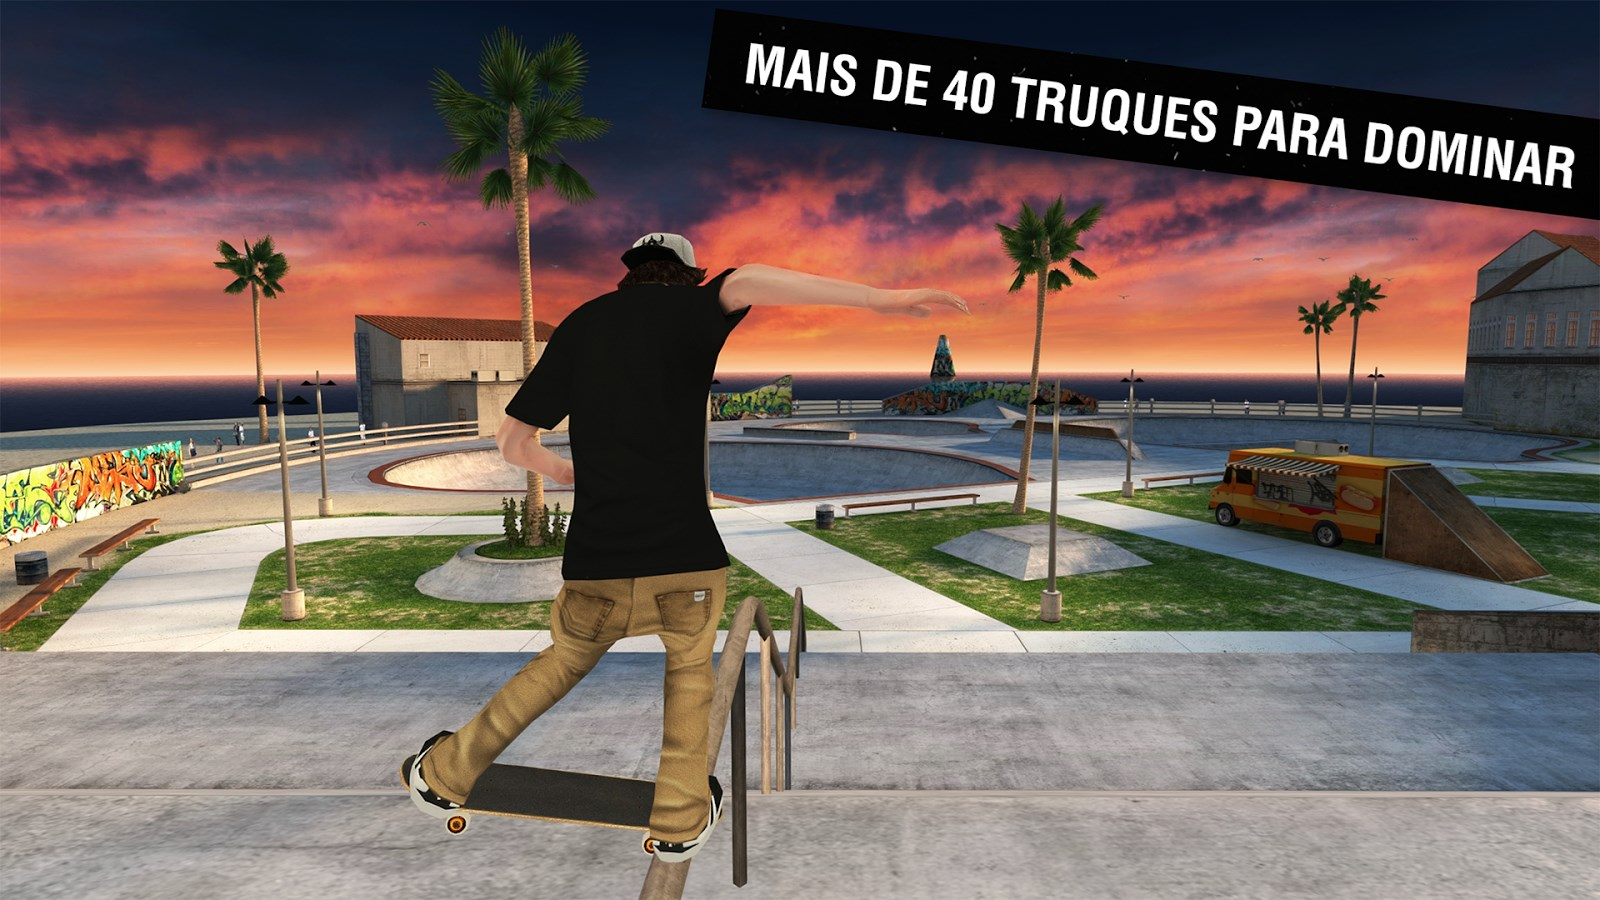 Skateboard Party 3 ft. Greg Lutzka - Imagem 1 do software